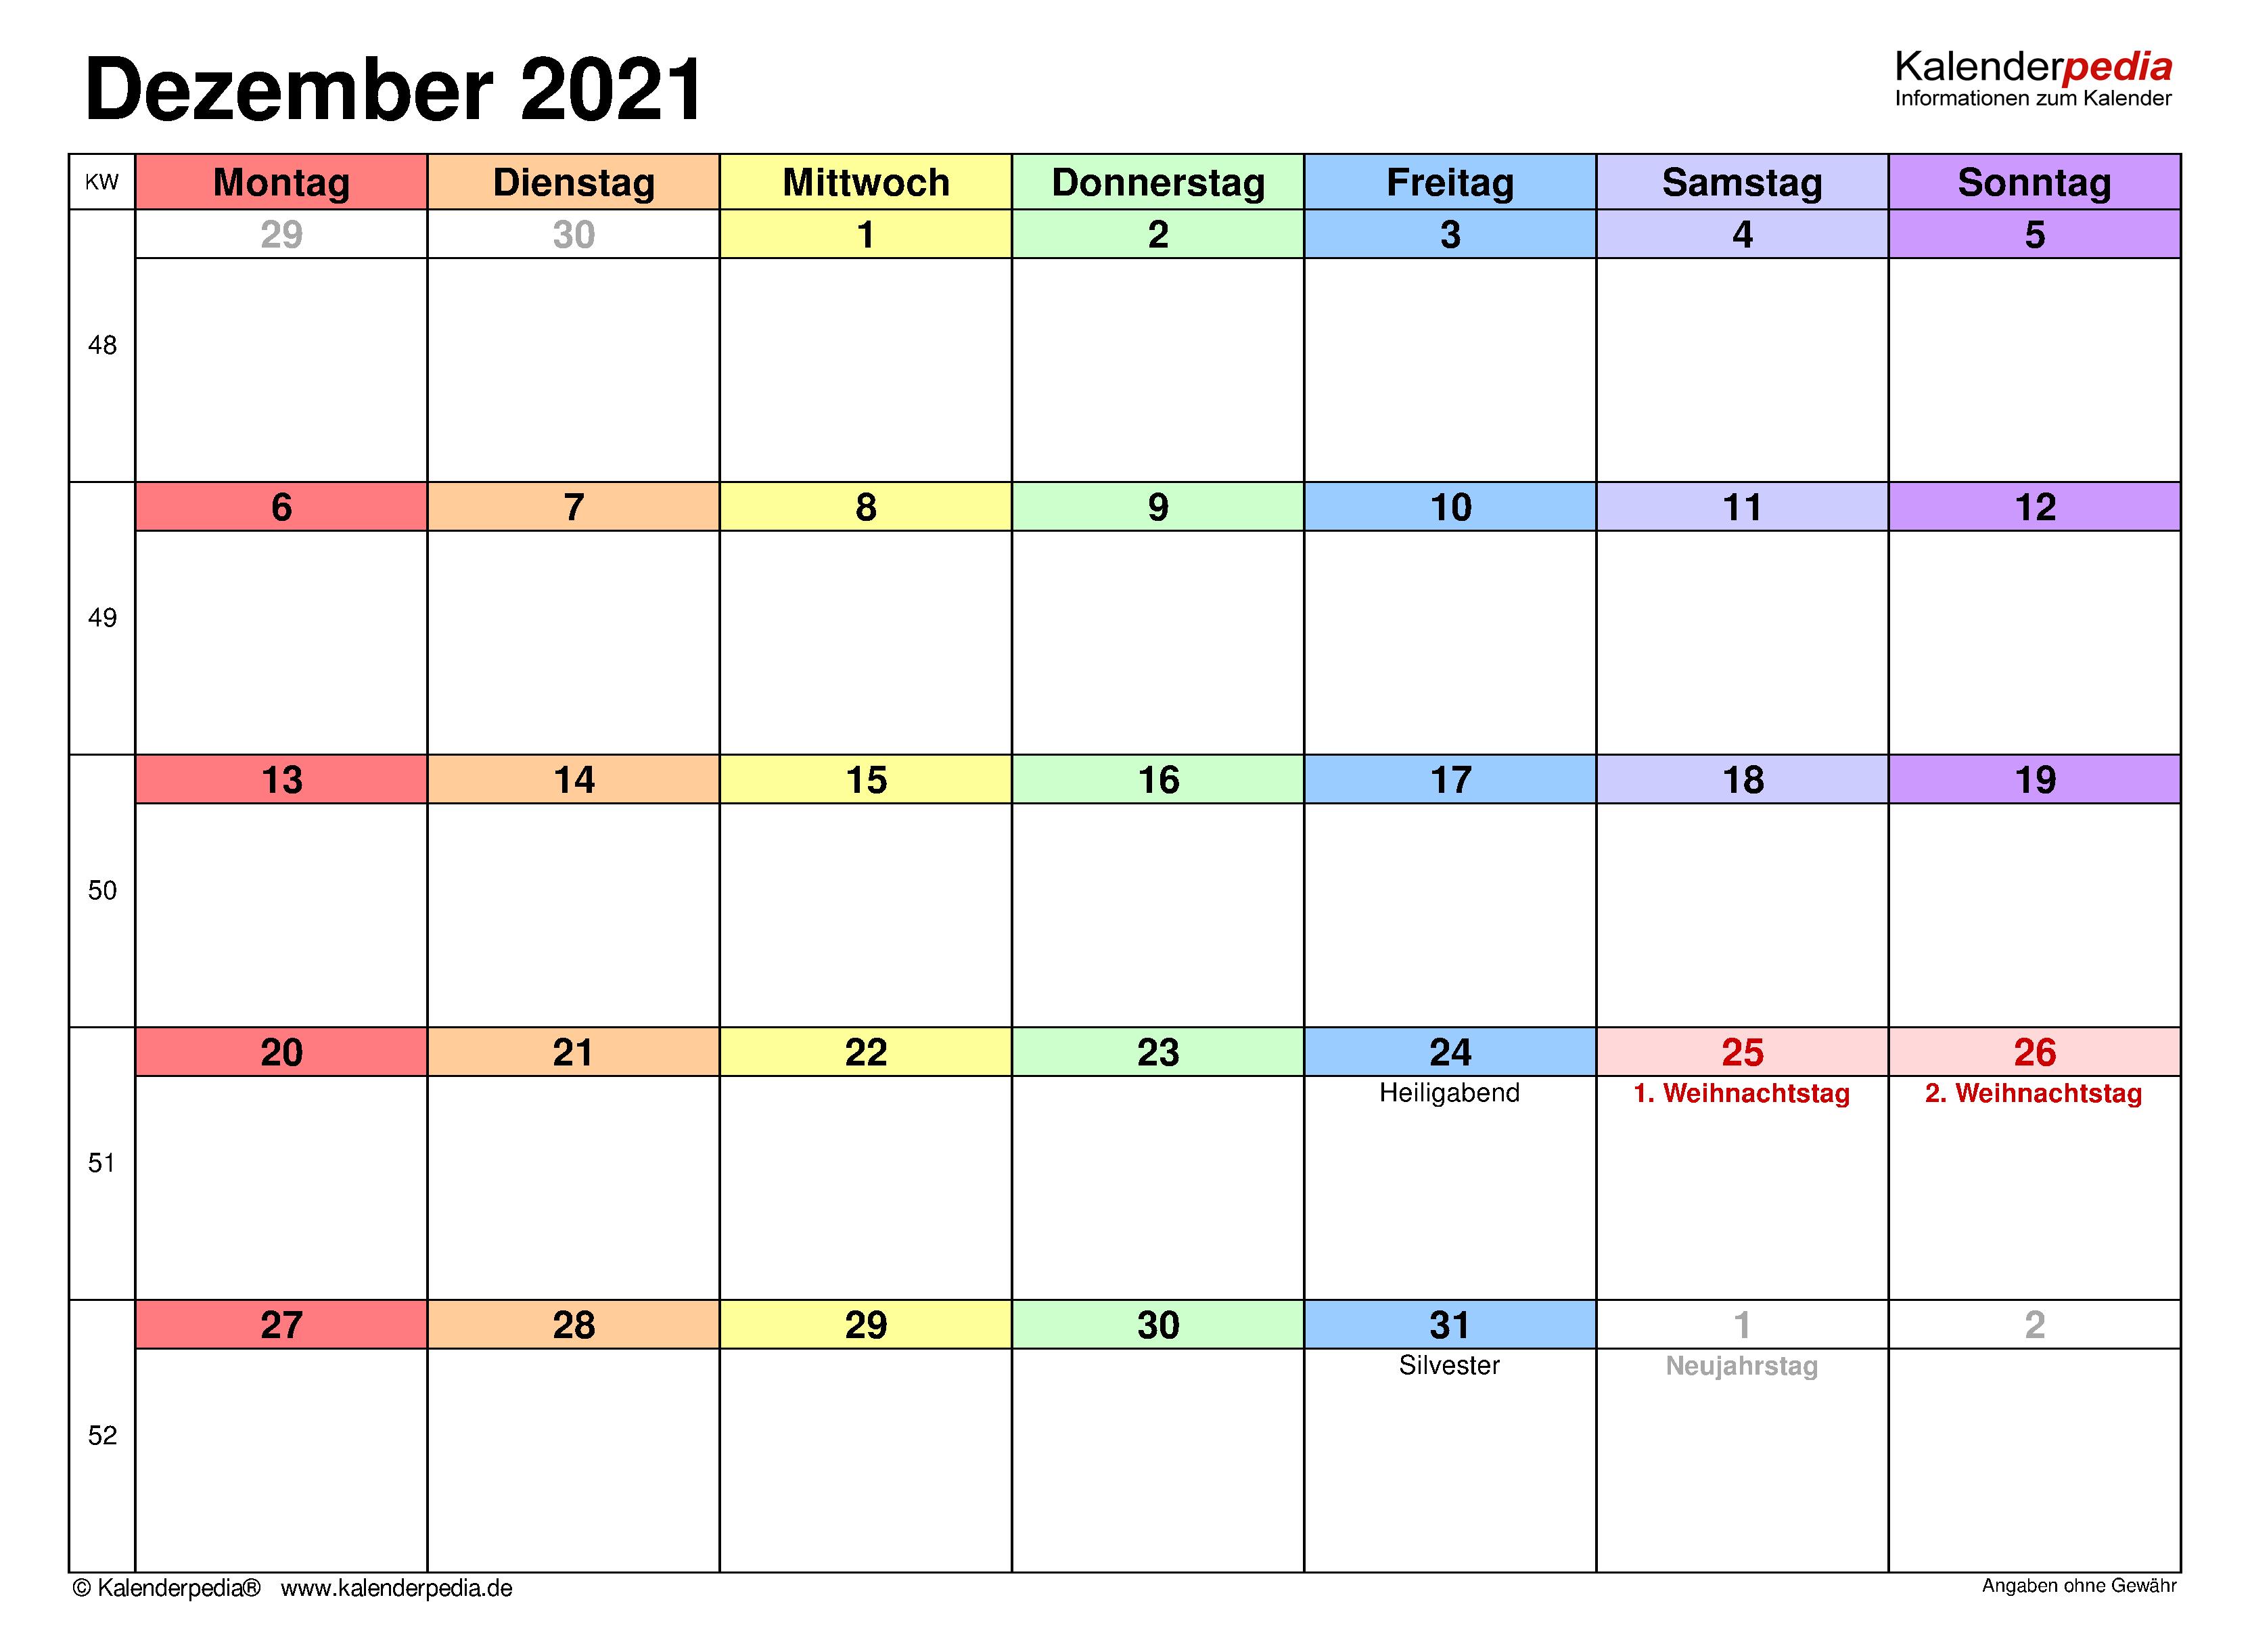 Kalender December 2021 als Excel-Vorlagen